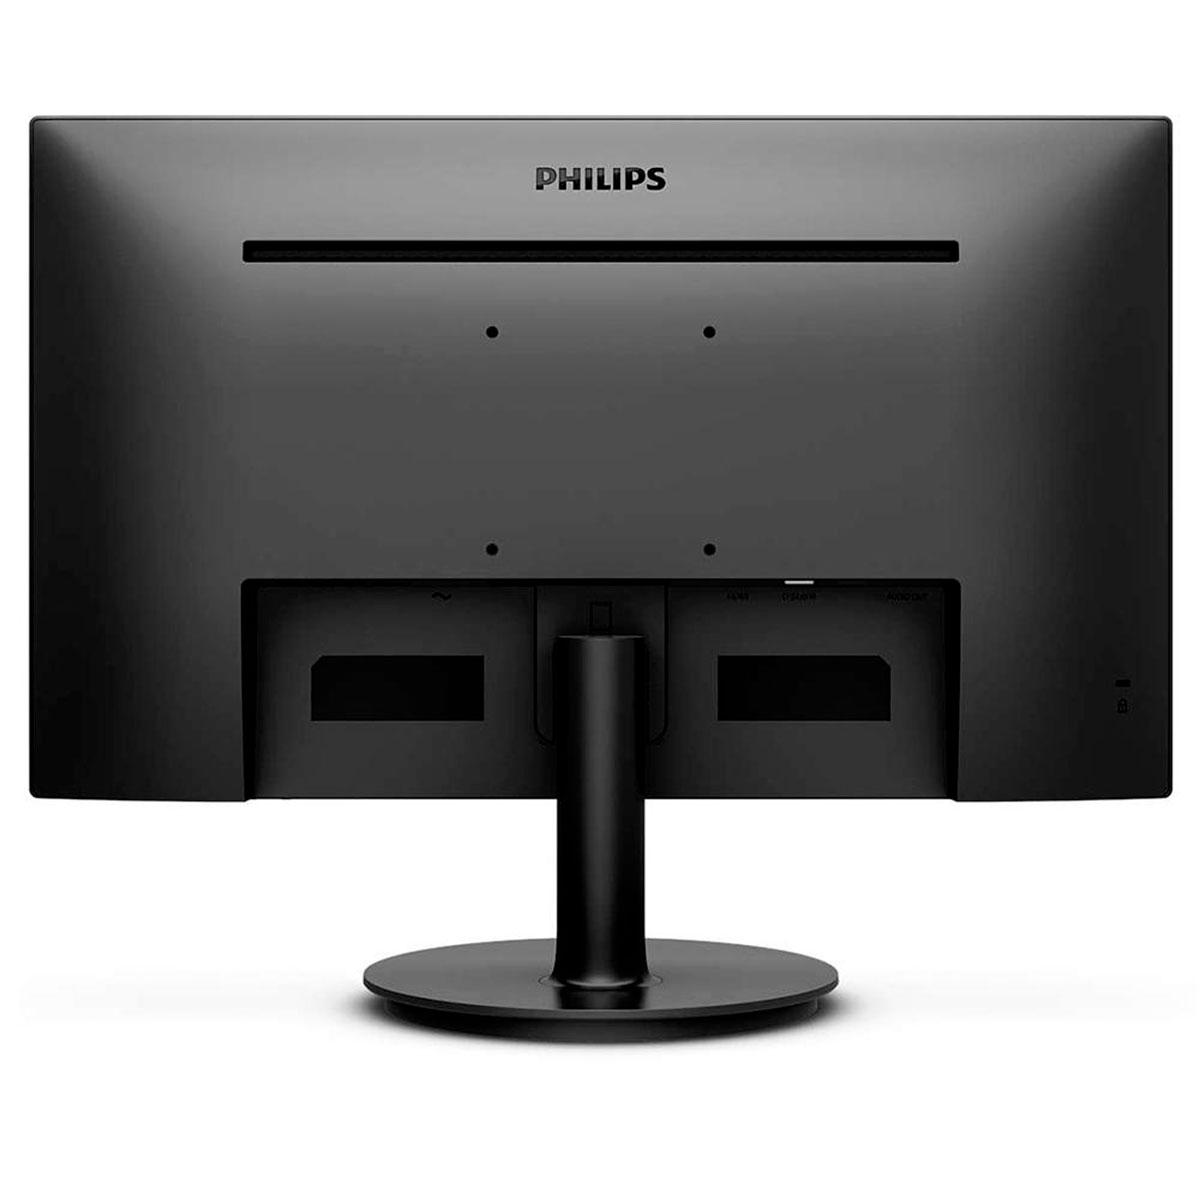 "Monitor Philips 221V8 21.5"", LED Full HD (1920 x 1080), Entradas HDMI e VGA, Bivolt, VESA"